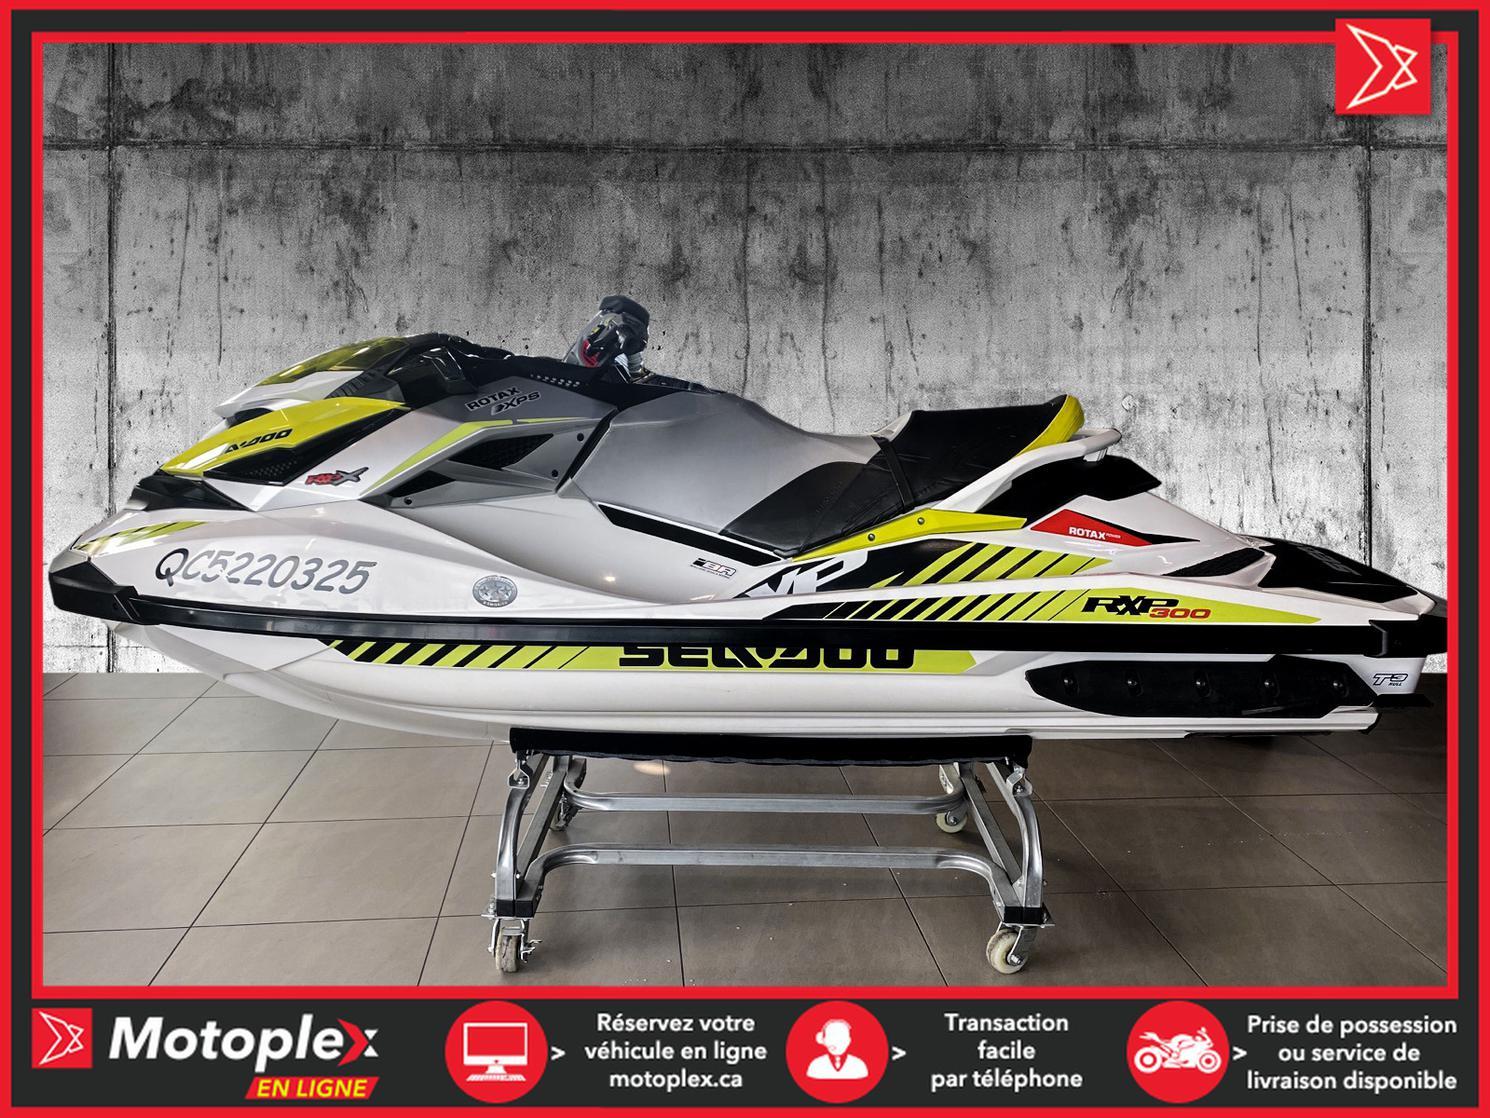 2016 Sea-Doo RXPX 300 - 69$/semaine